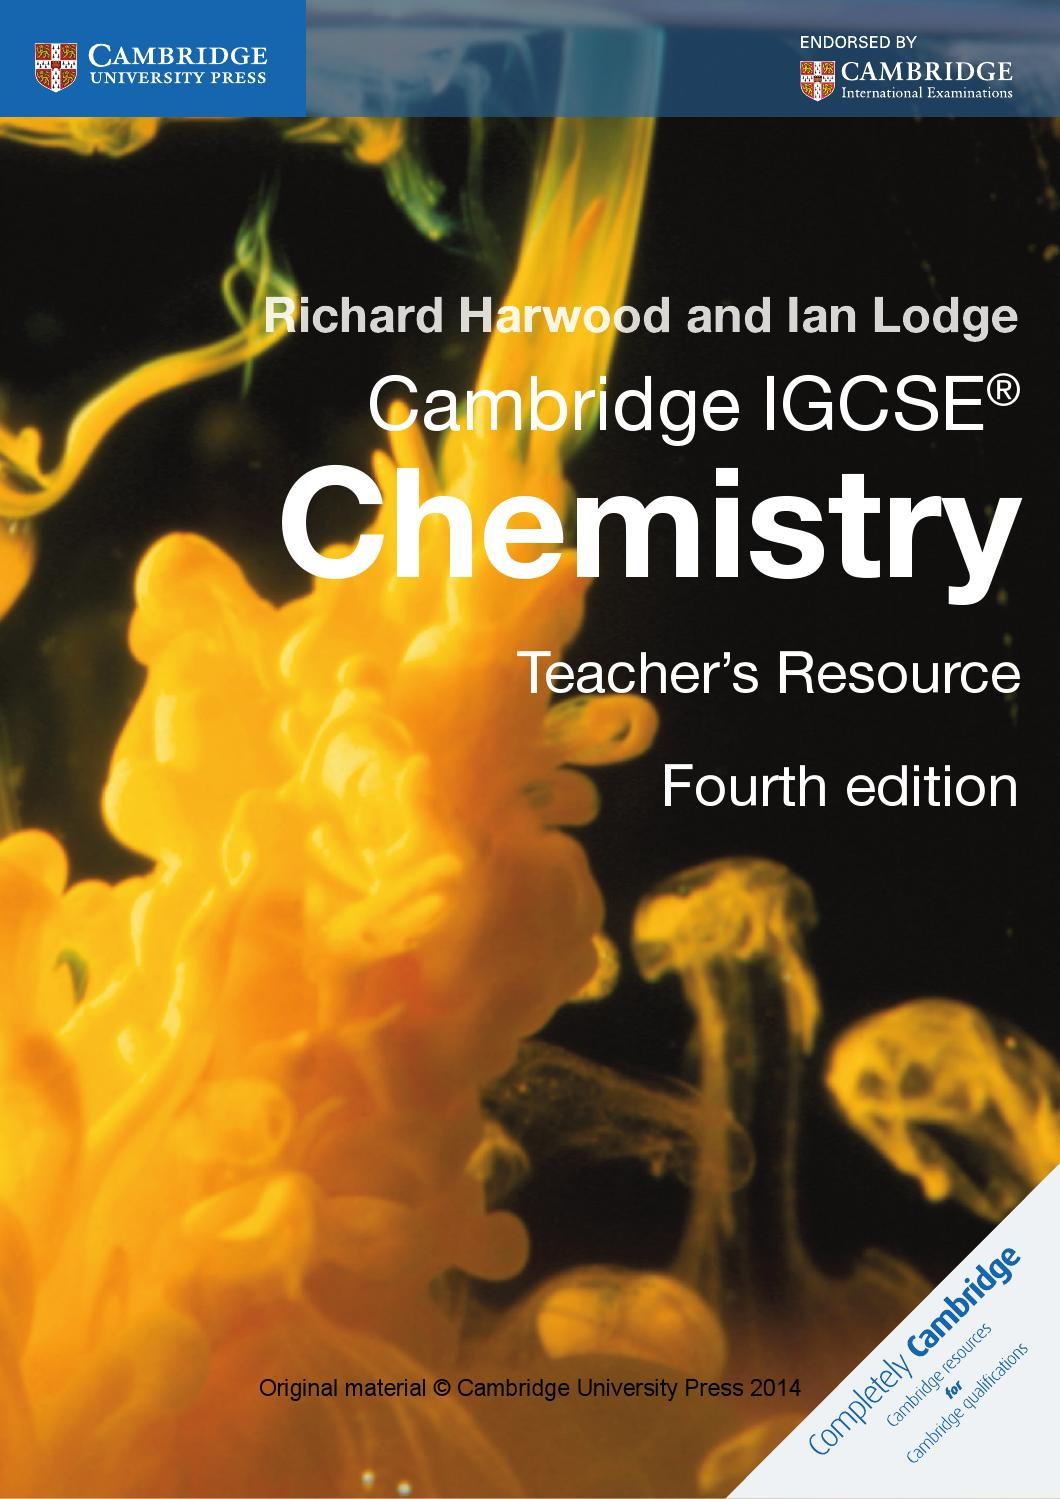 cambridge igcse chemistry teacher u0026 39 s resource  fourth edition  by cambridge university press